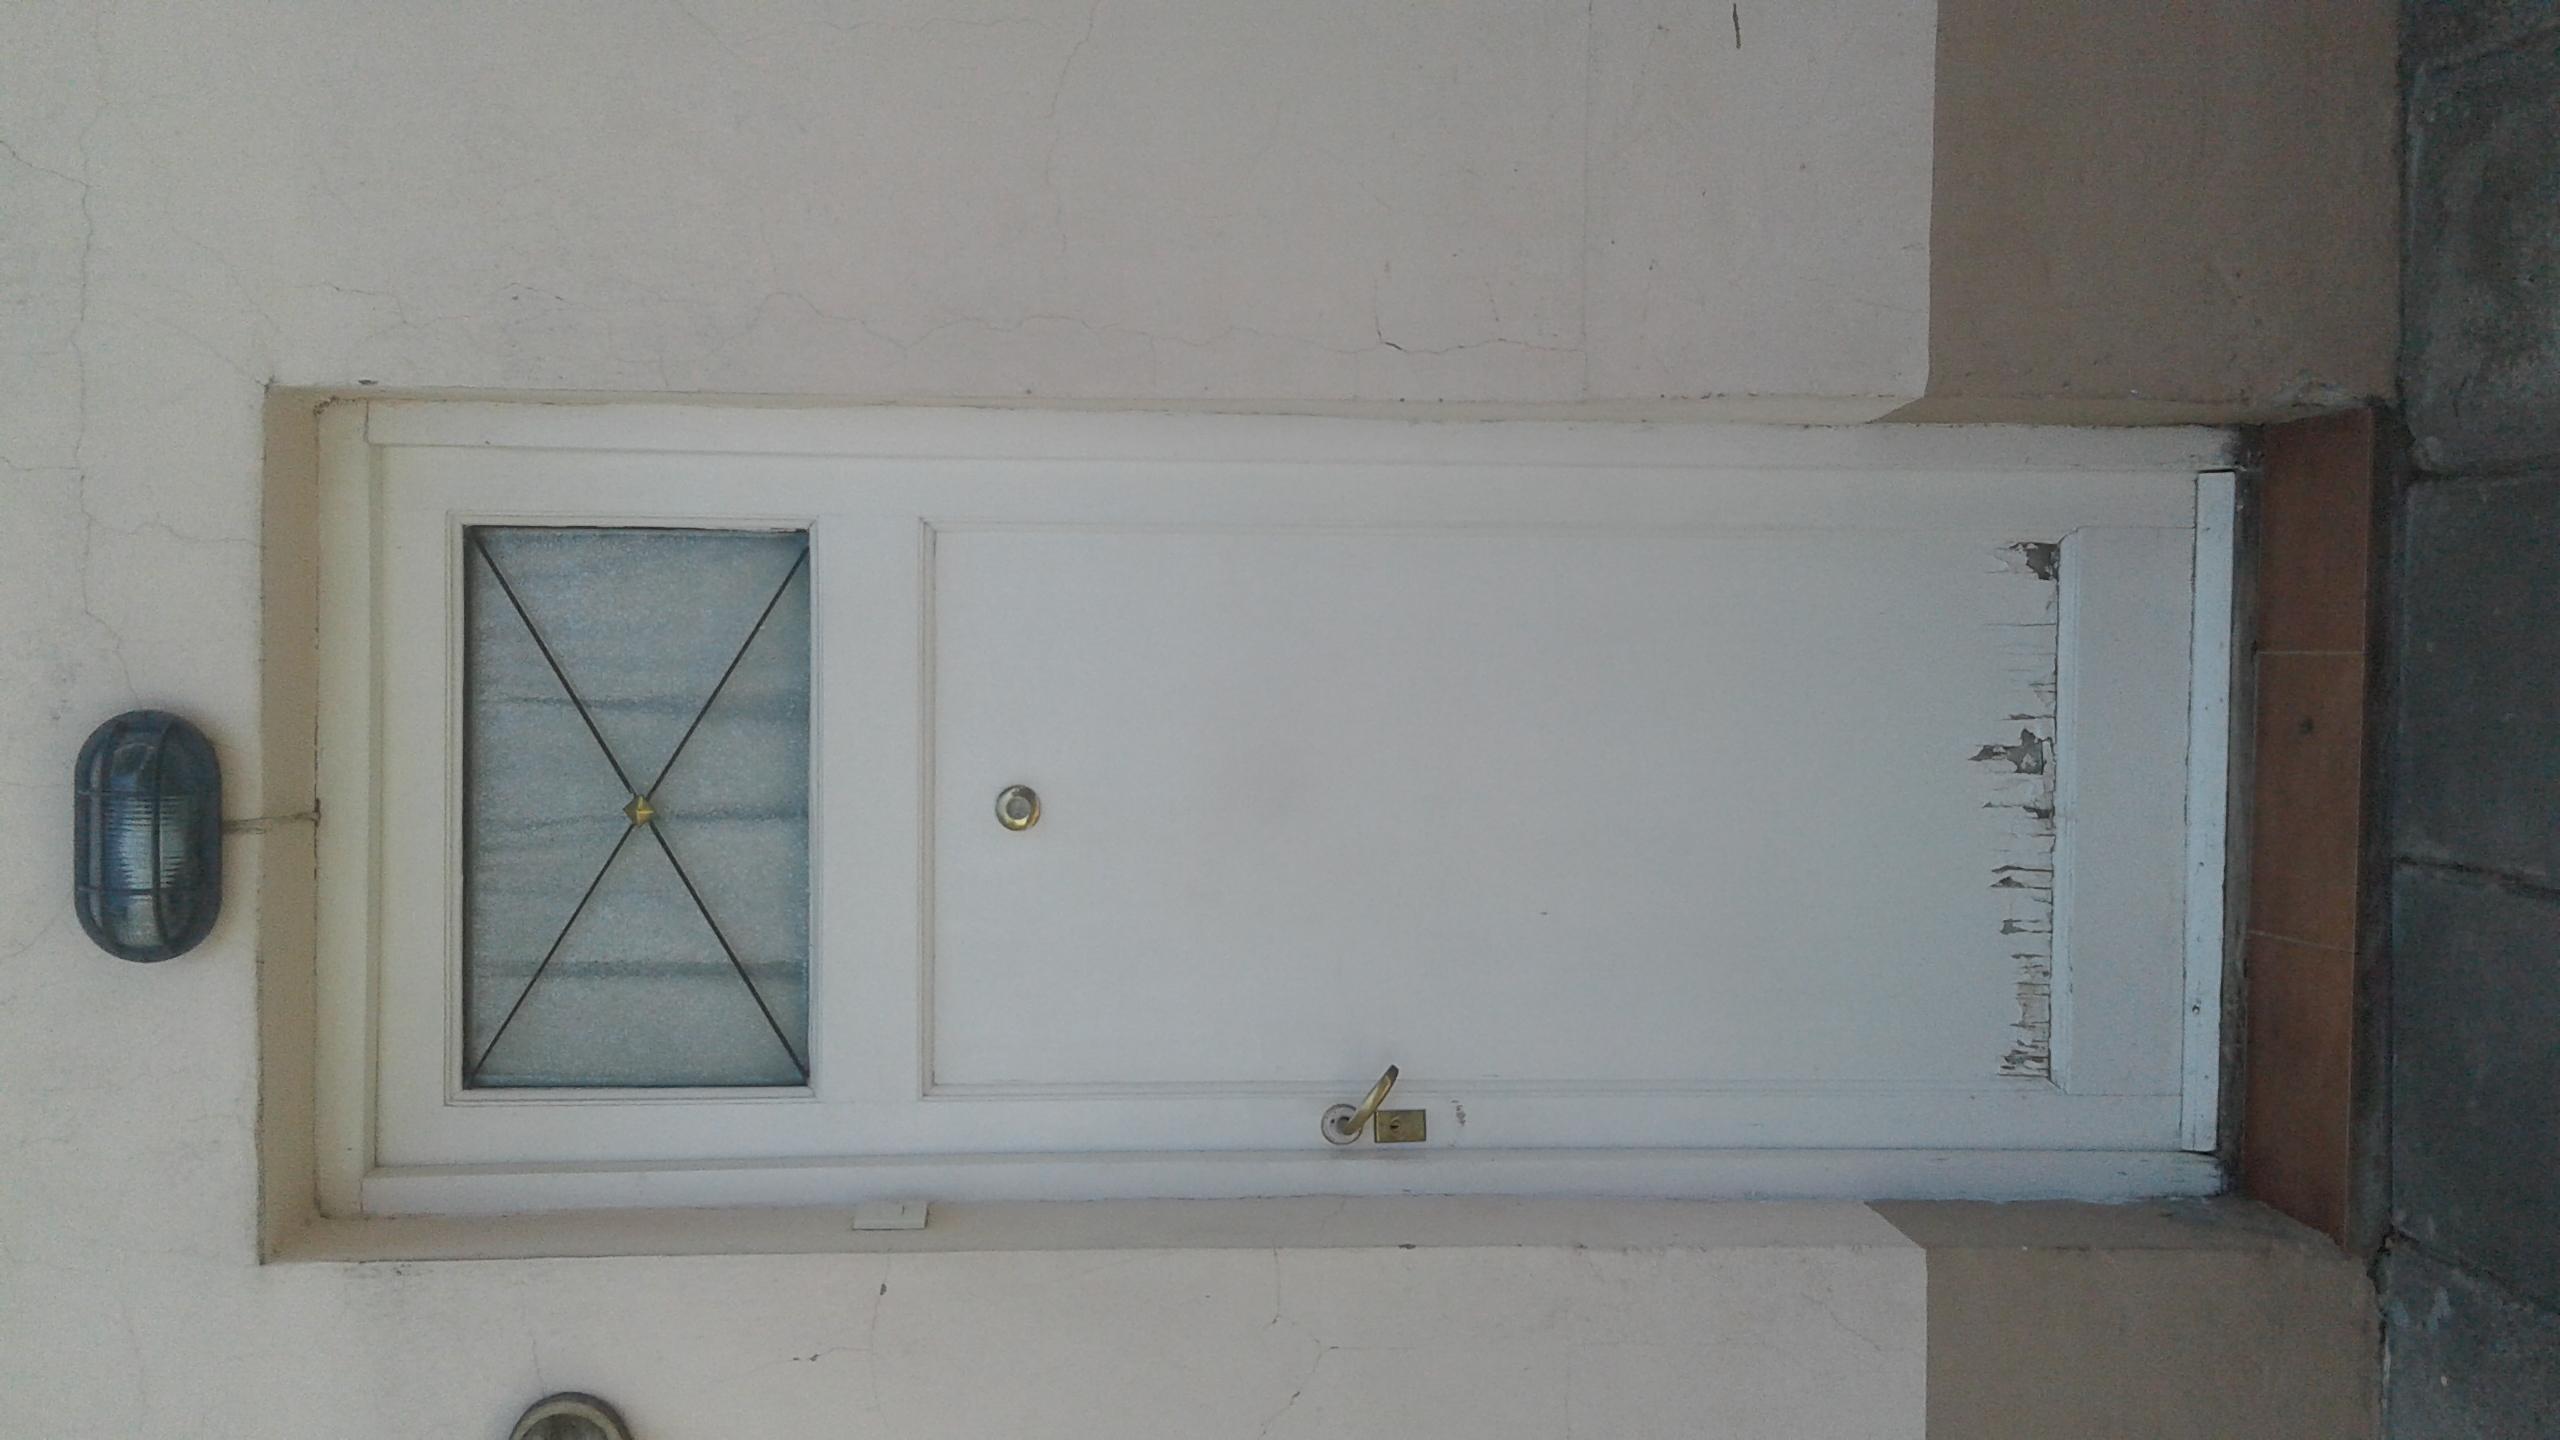 Vendo puerta frente, madera